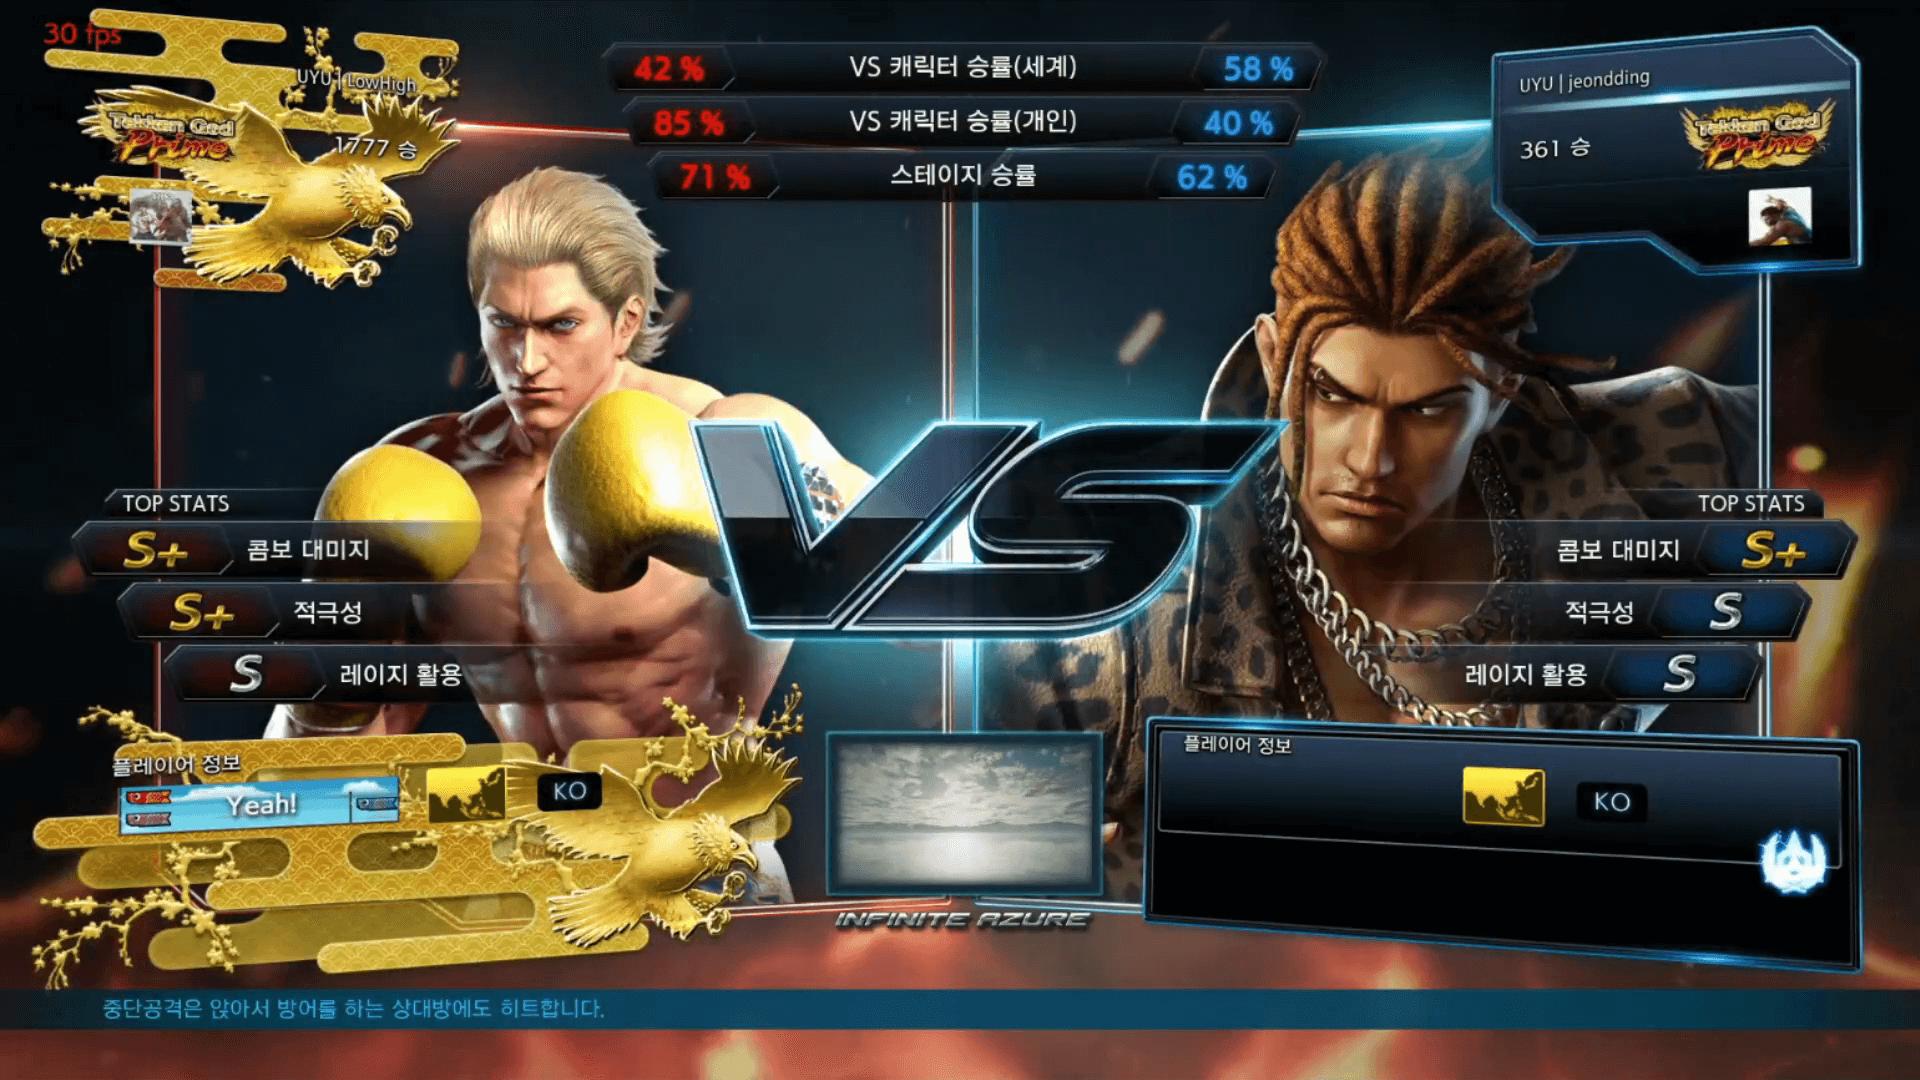 LowHigh Wins Tekken 7 Streamer Battle